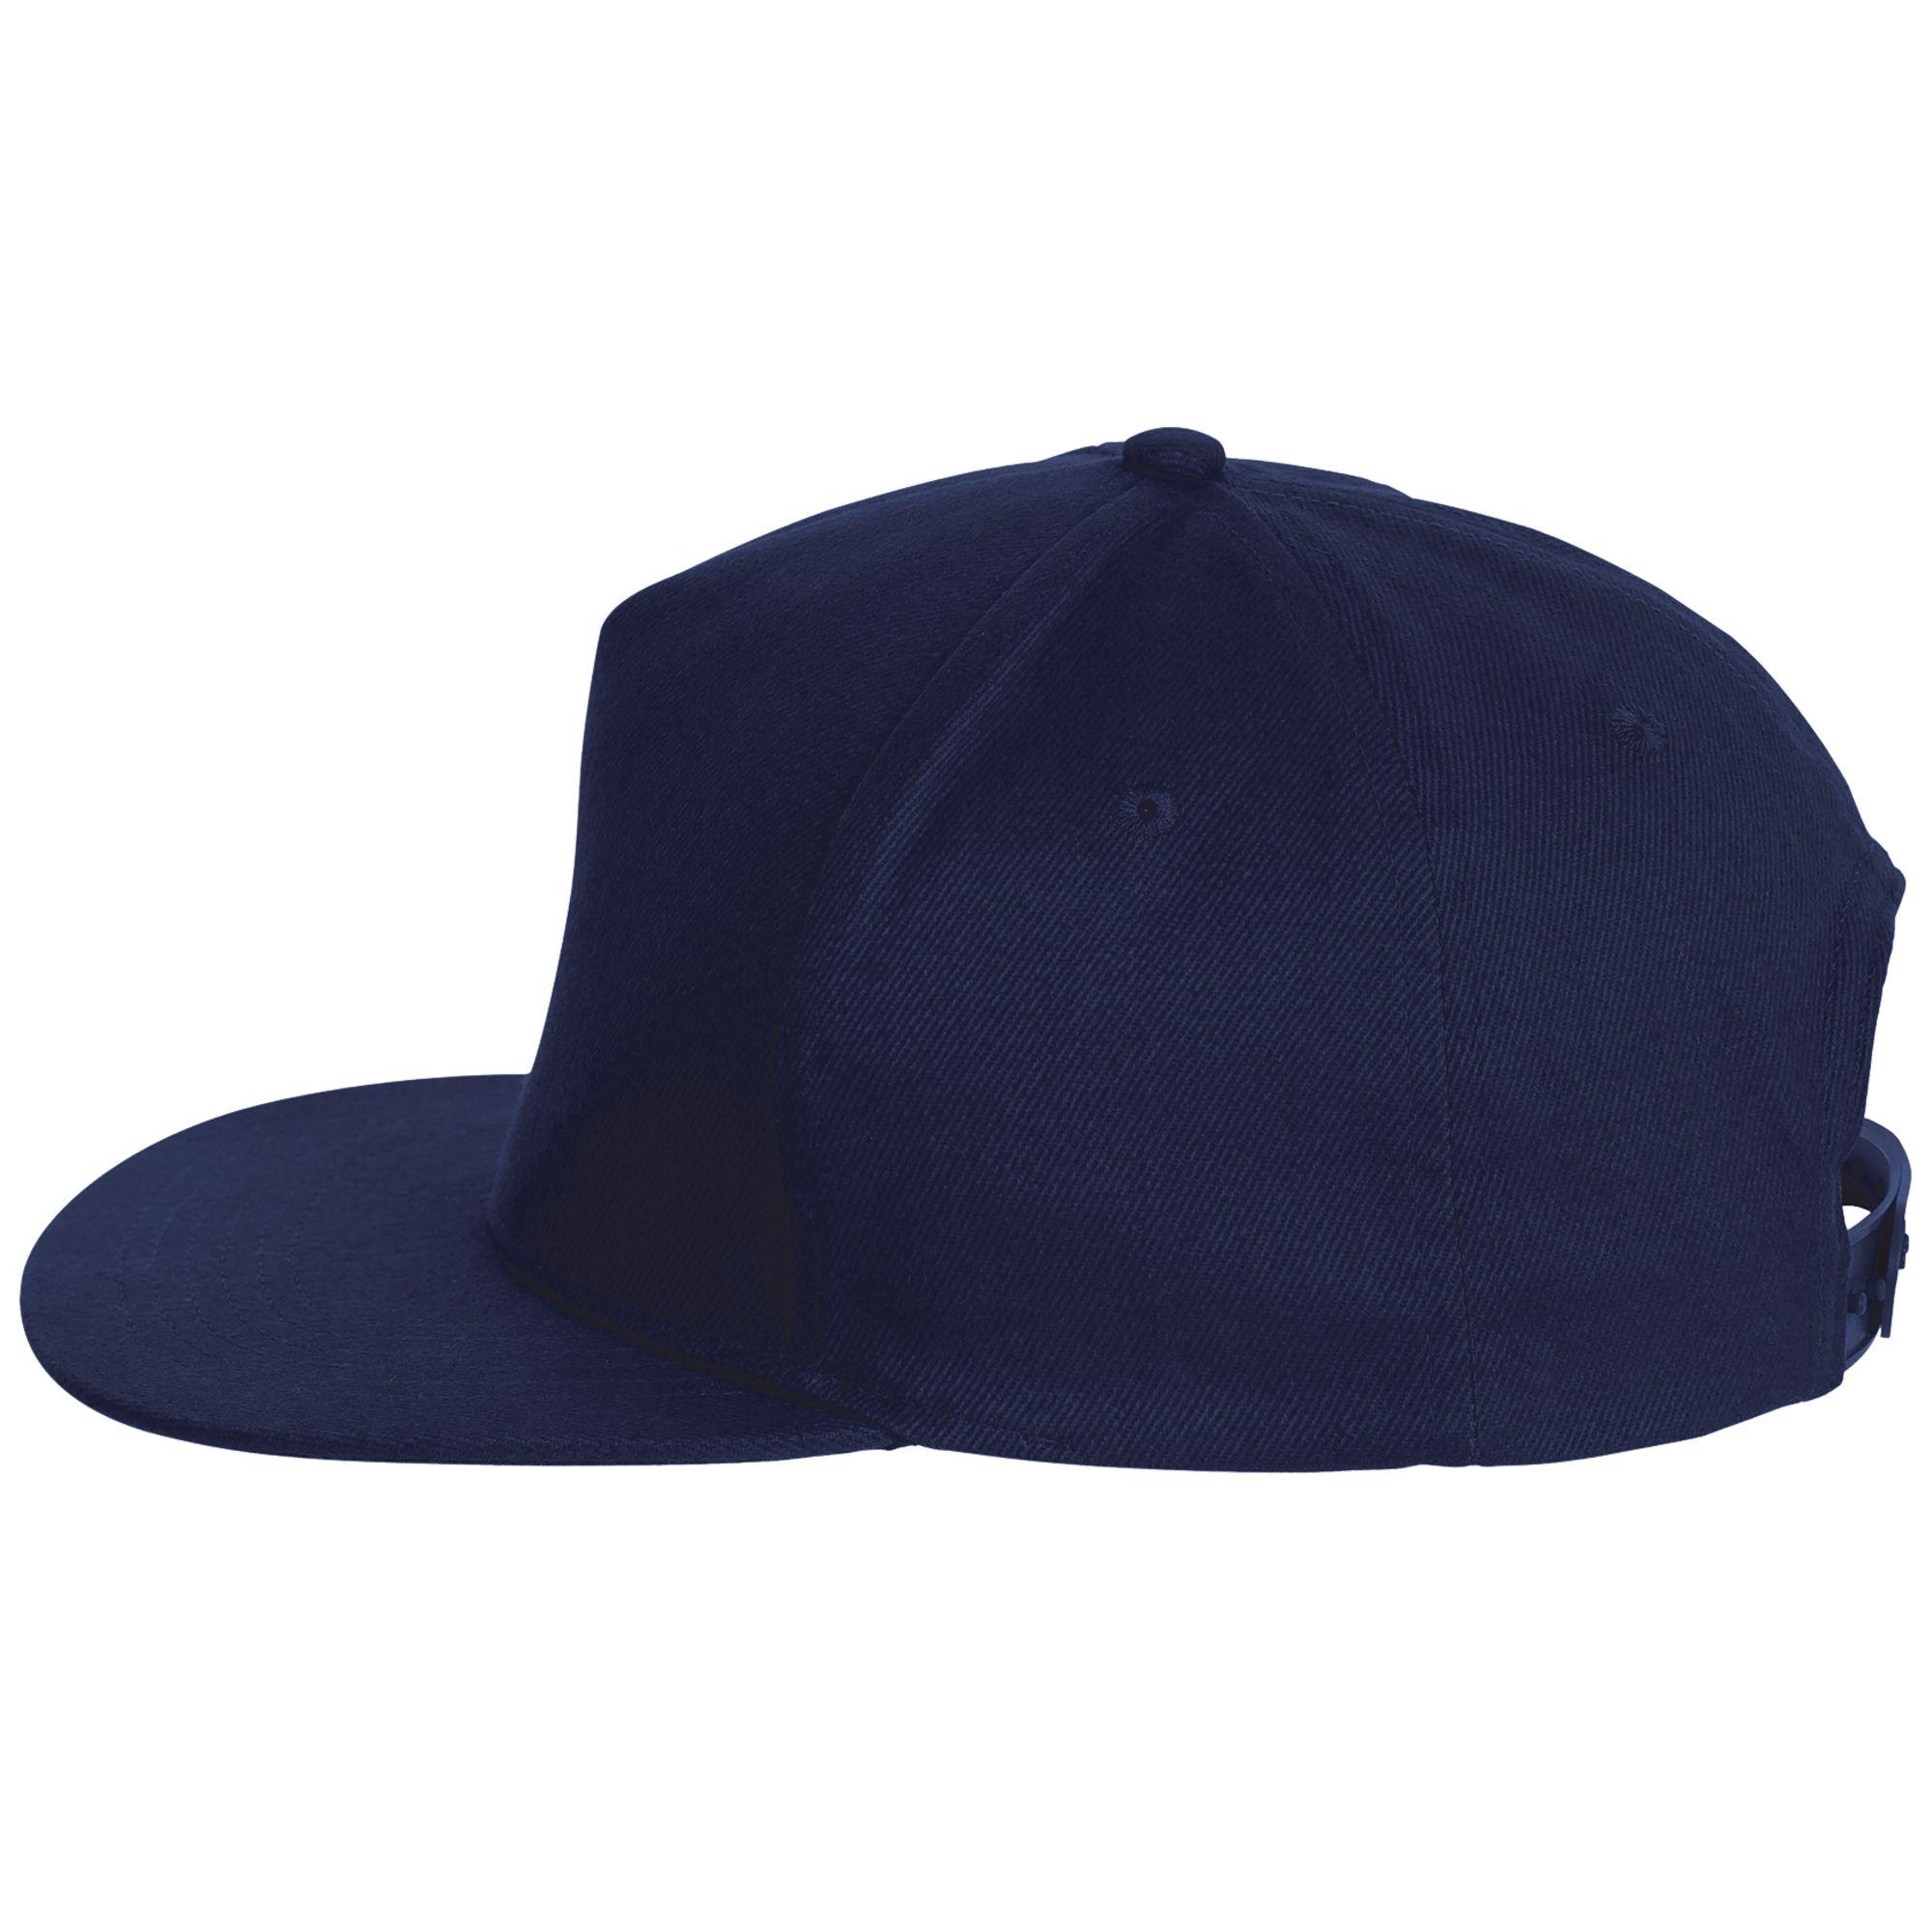 Бейсболка SONIC, темно-синяя